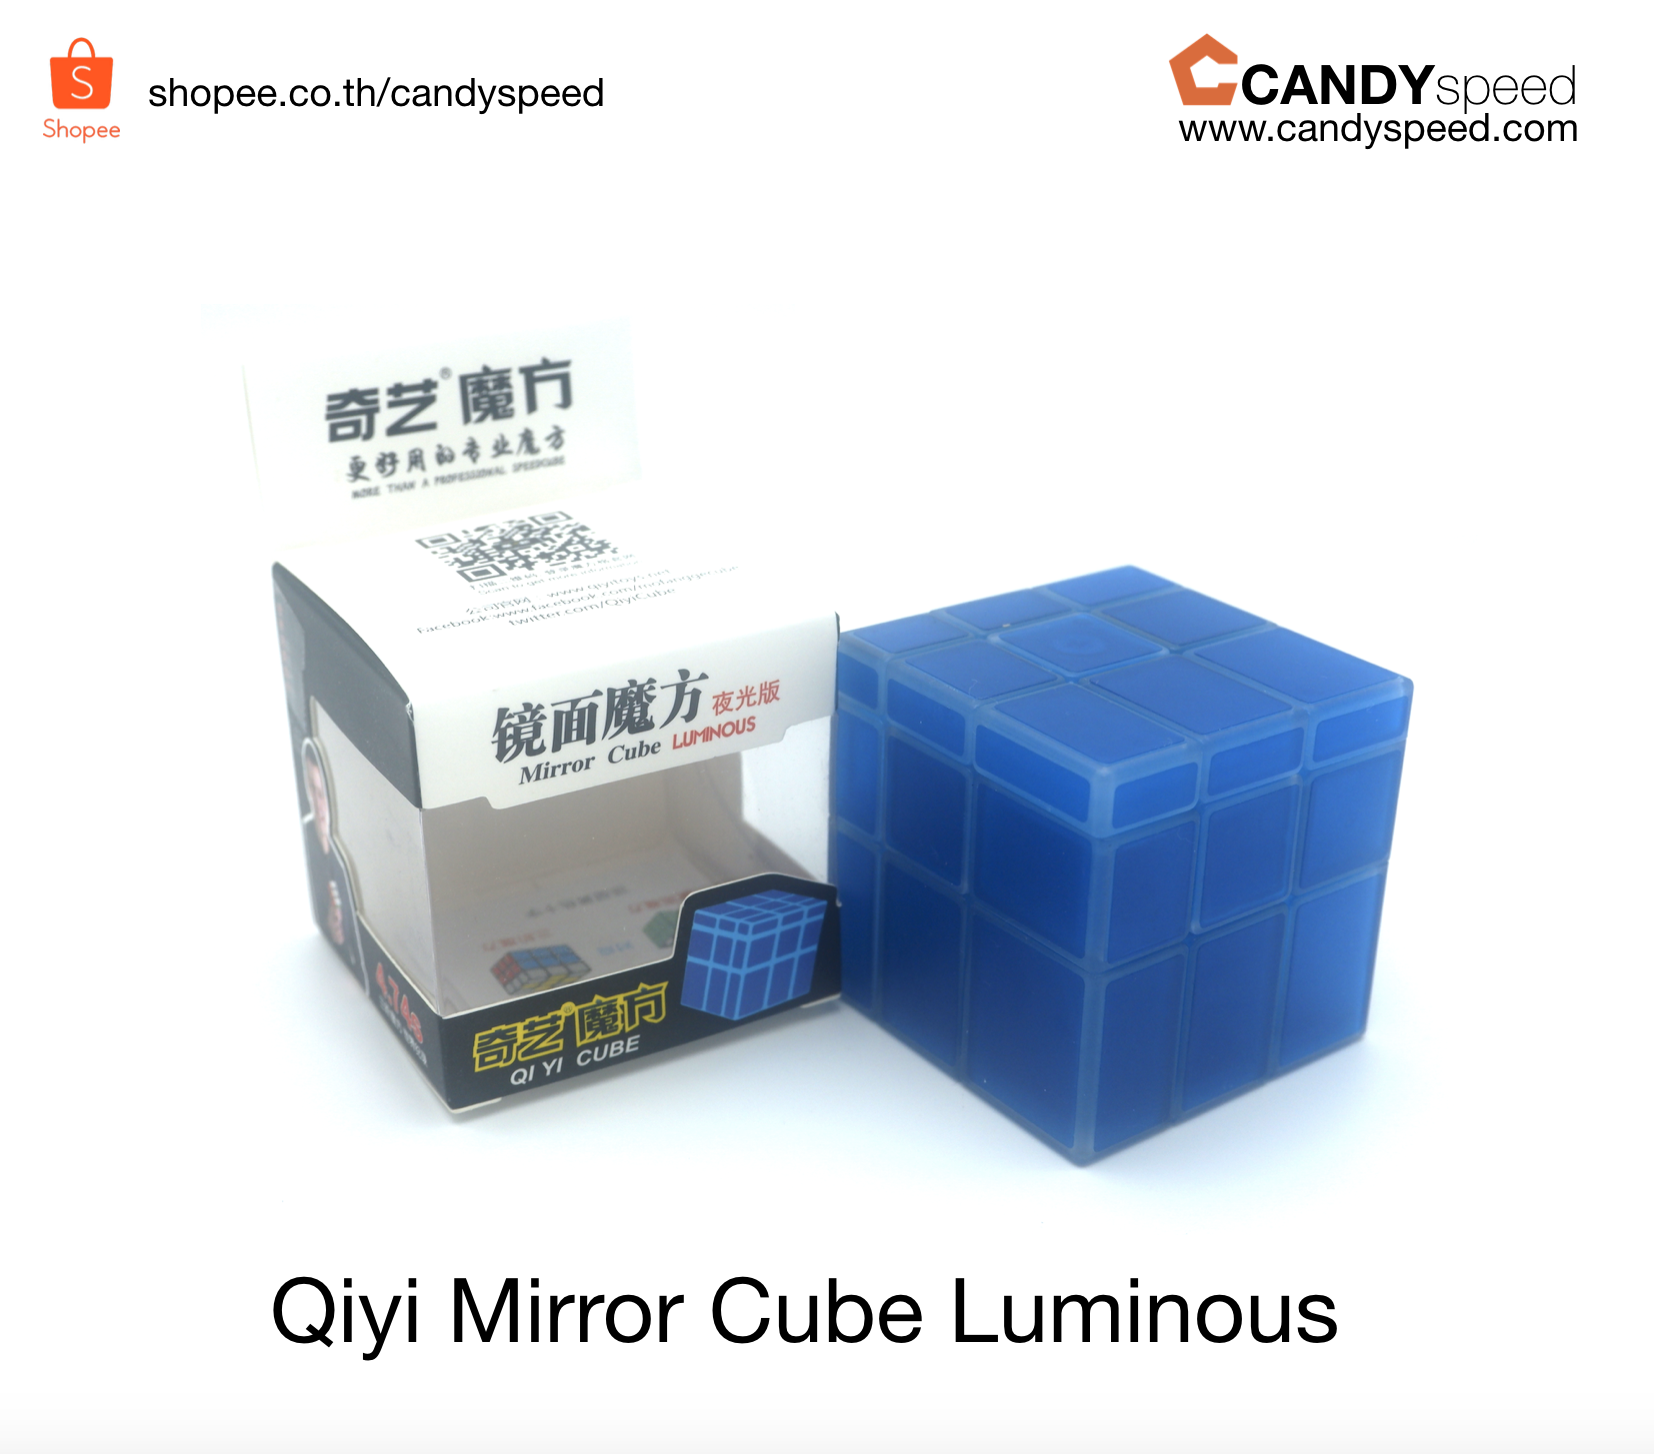 Qiyi Mirror Cube Luminous *เรืองแสง*